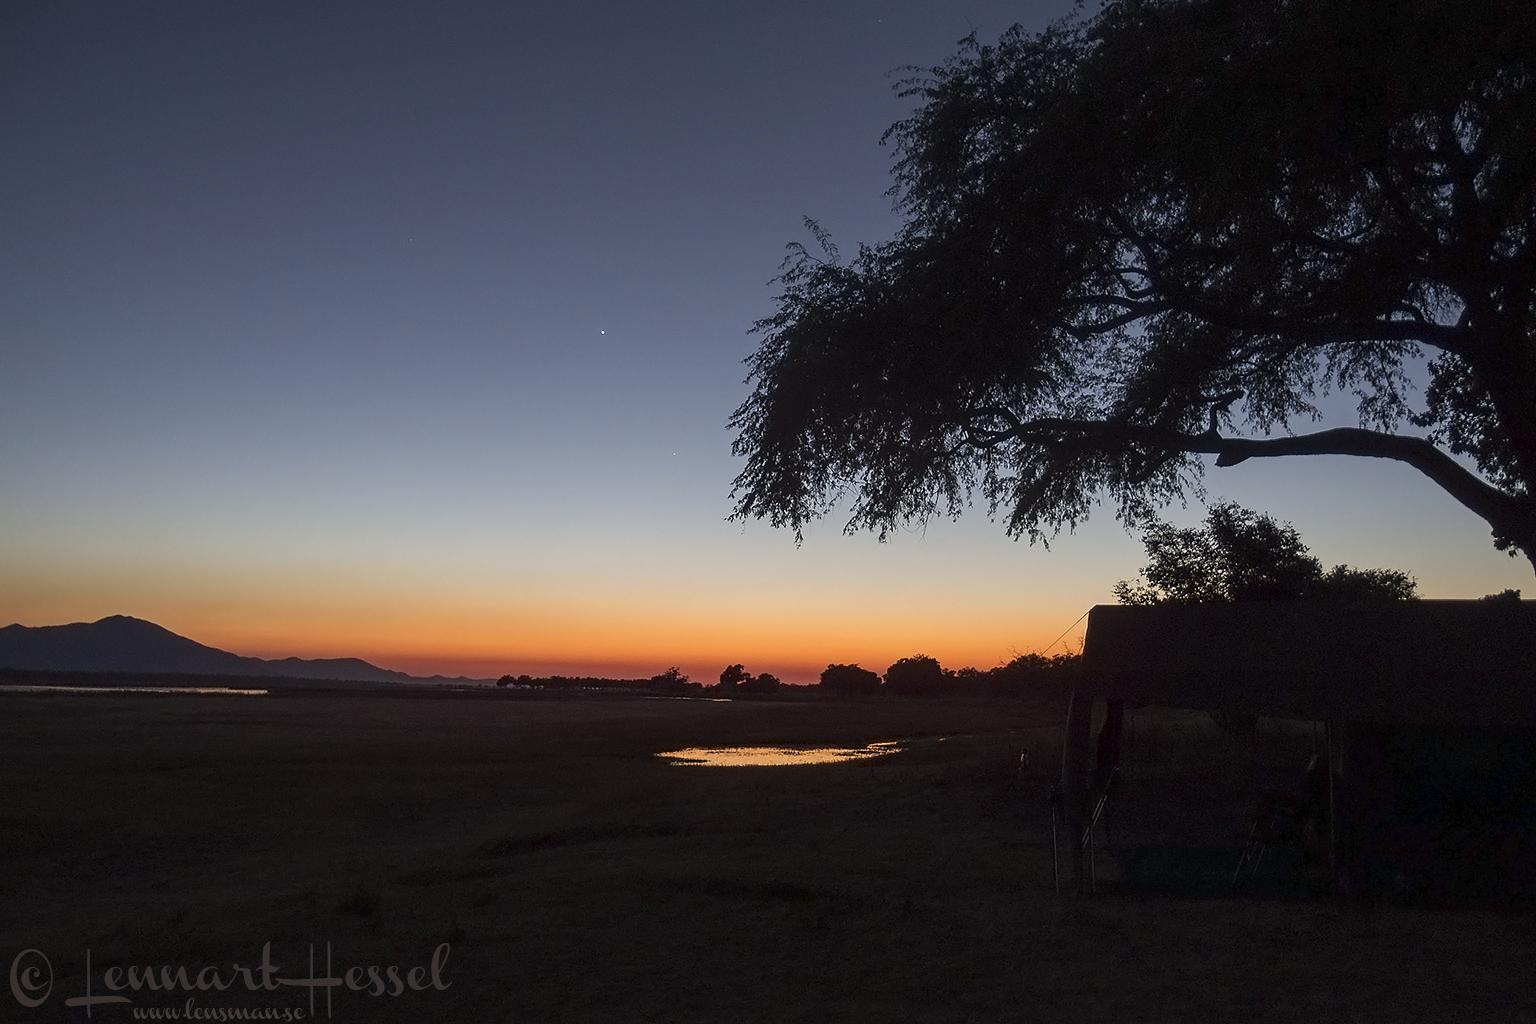 Sunrise seen on safari in Mana Pools